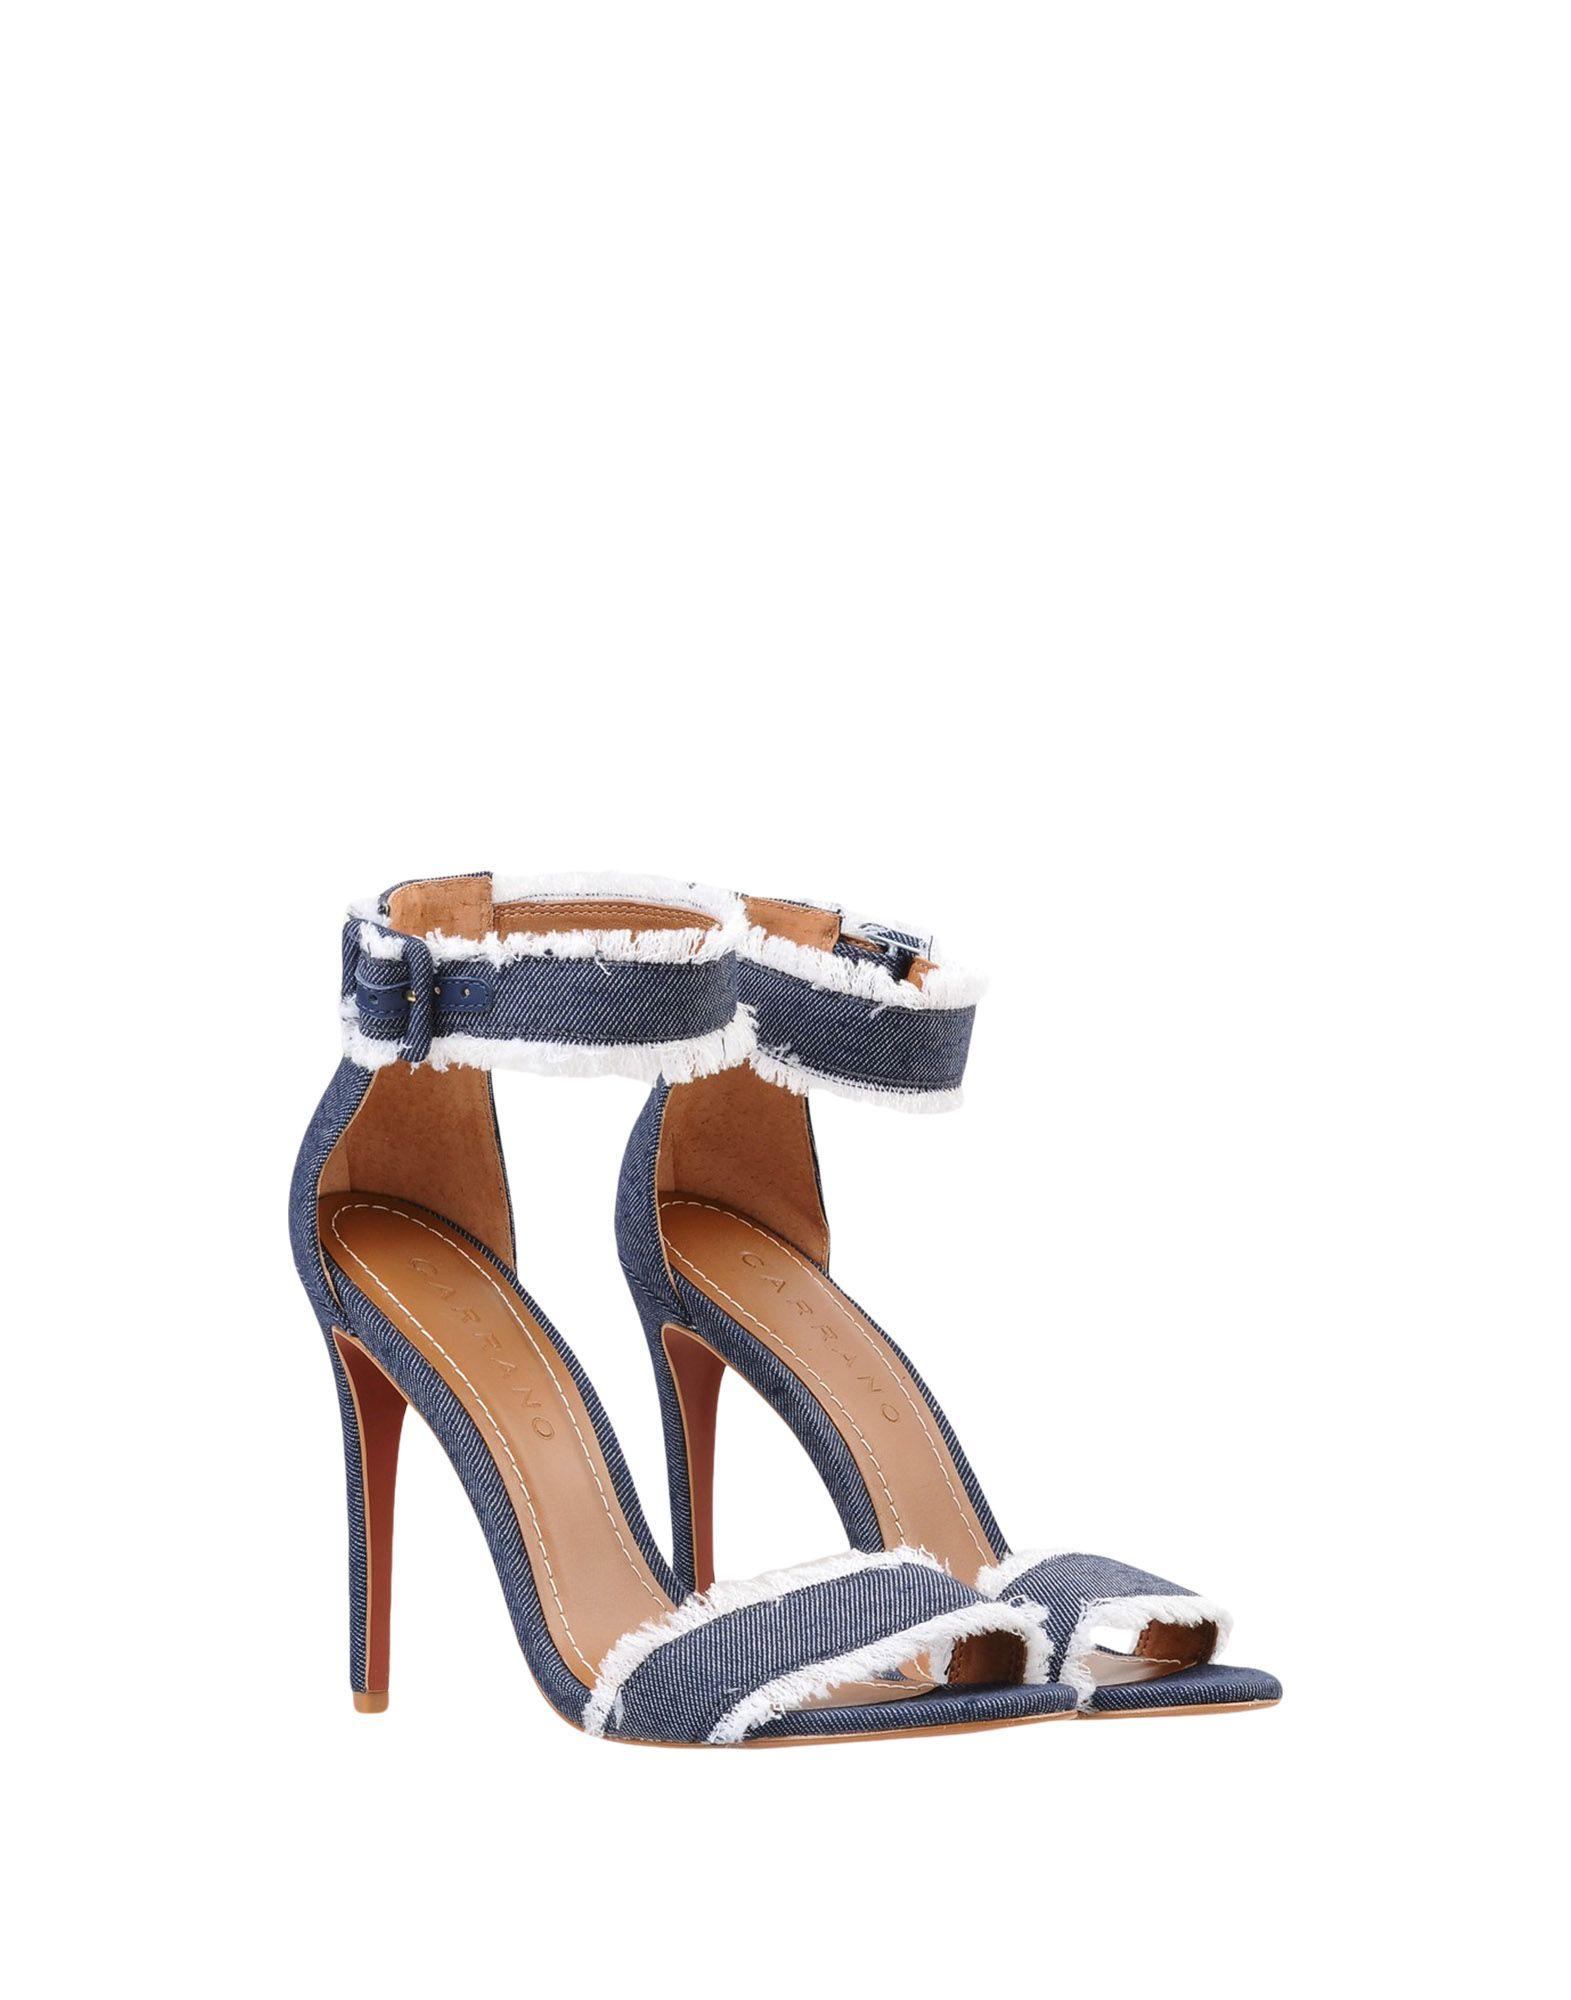 Carrano beliebte Sandals  11456865UH Gute Qualität beliebte Carrano Schuhe f31280